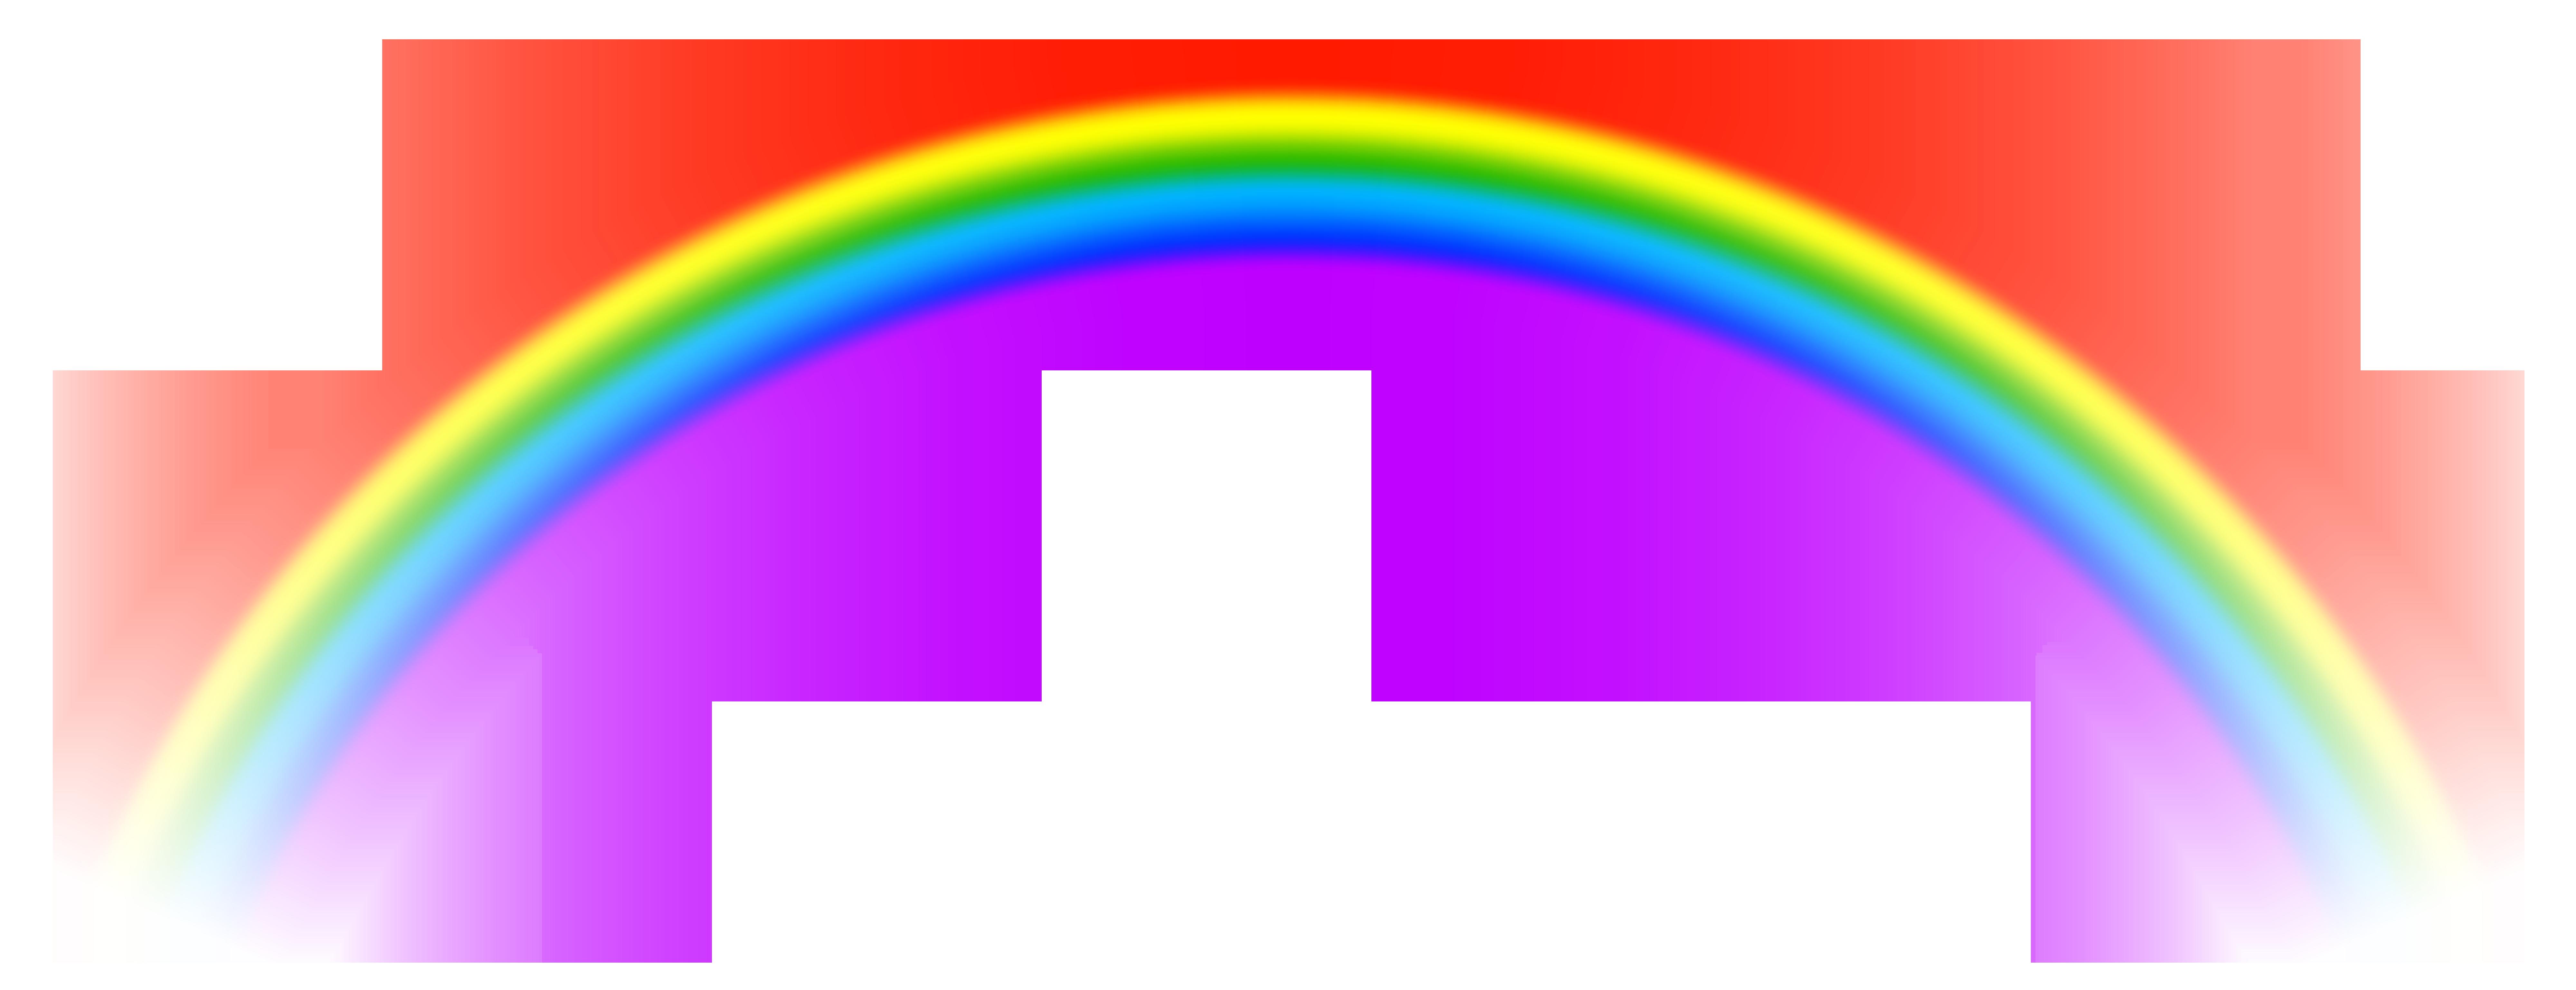 Transparent background rainbow clipart clip art freeuse library Transparent Rainbow PNG Free Clip Art Image | Gallery ... clip art freeuse library